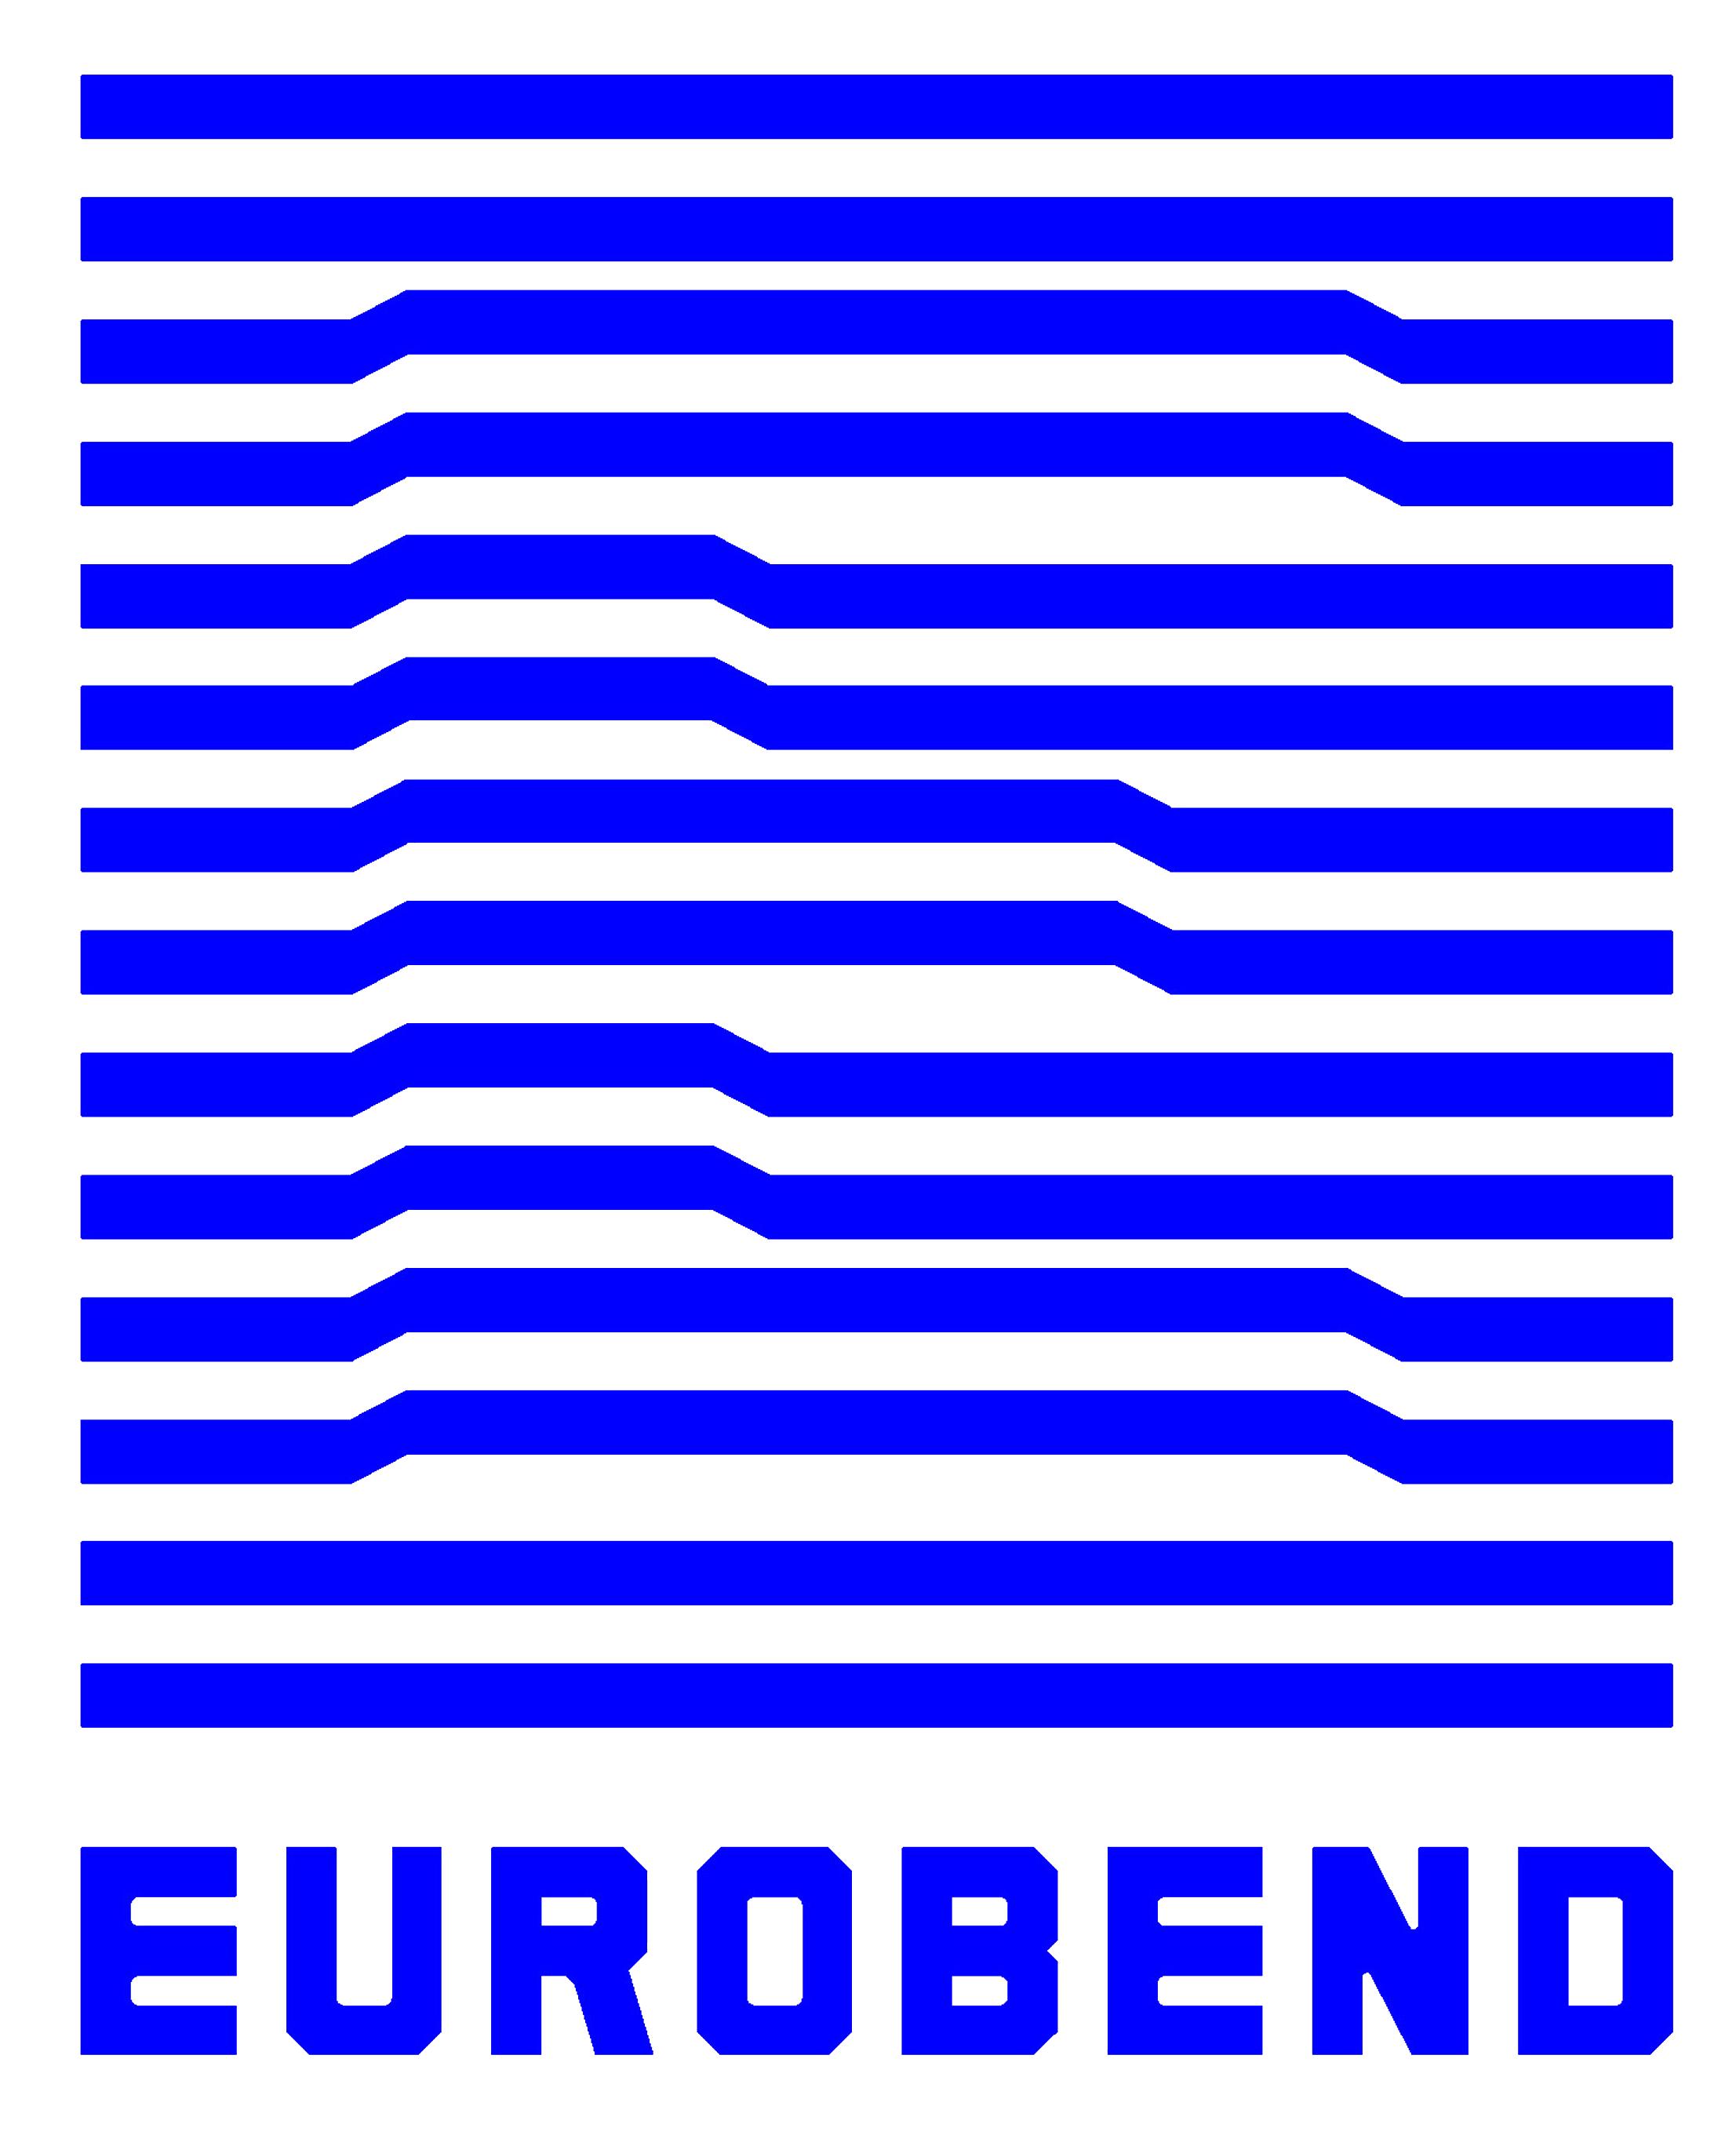 EUROBEND LOGO 1 Trans (300dpi)